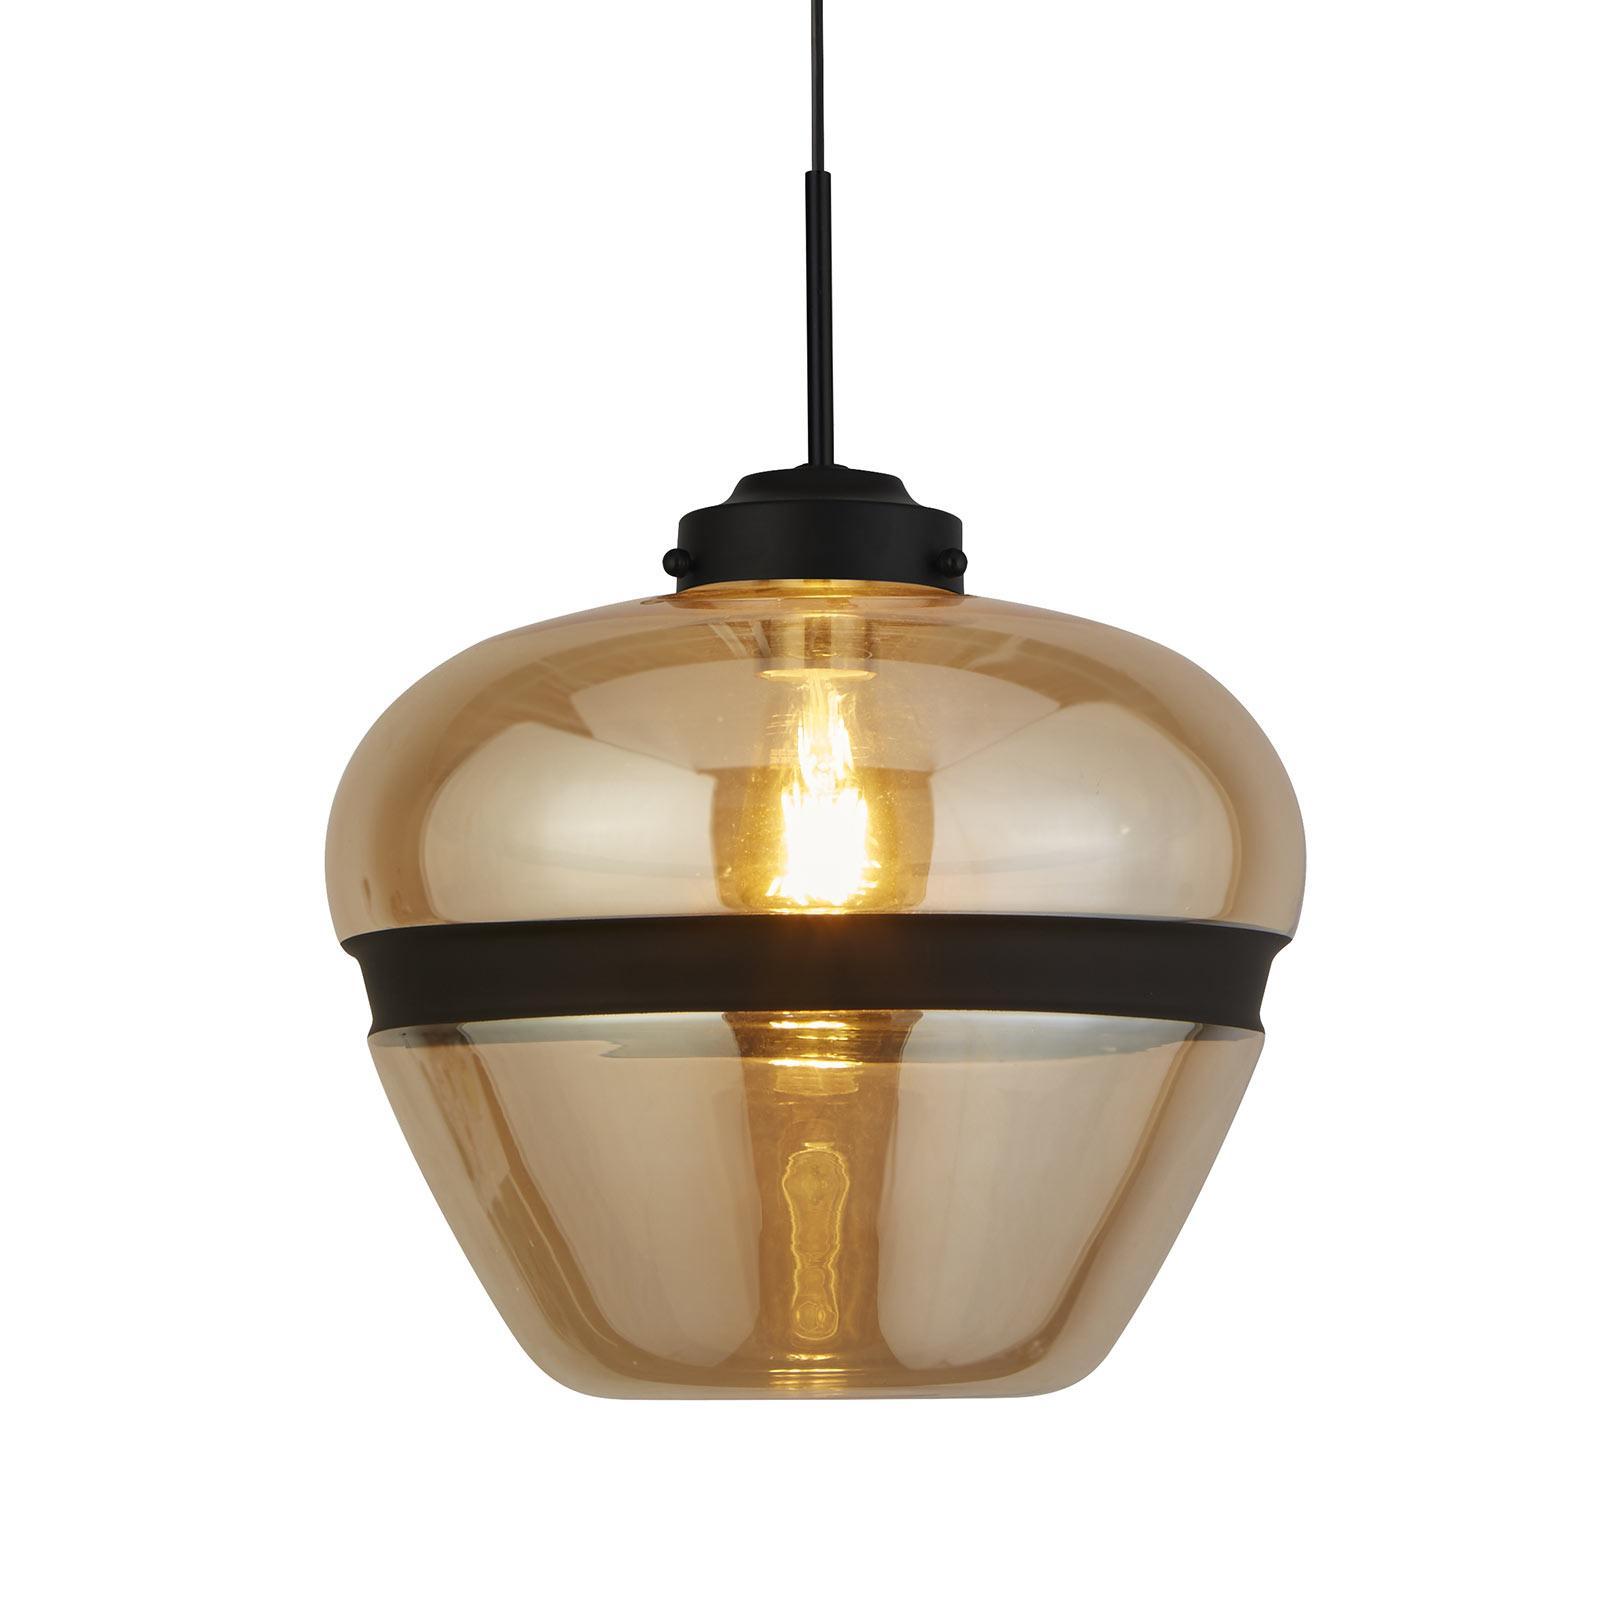 Lampa wisząca Meringue ze szkła, Ø 32 cm szampan